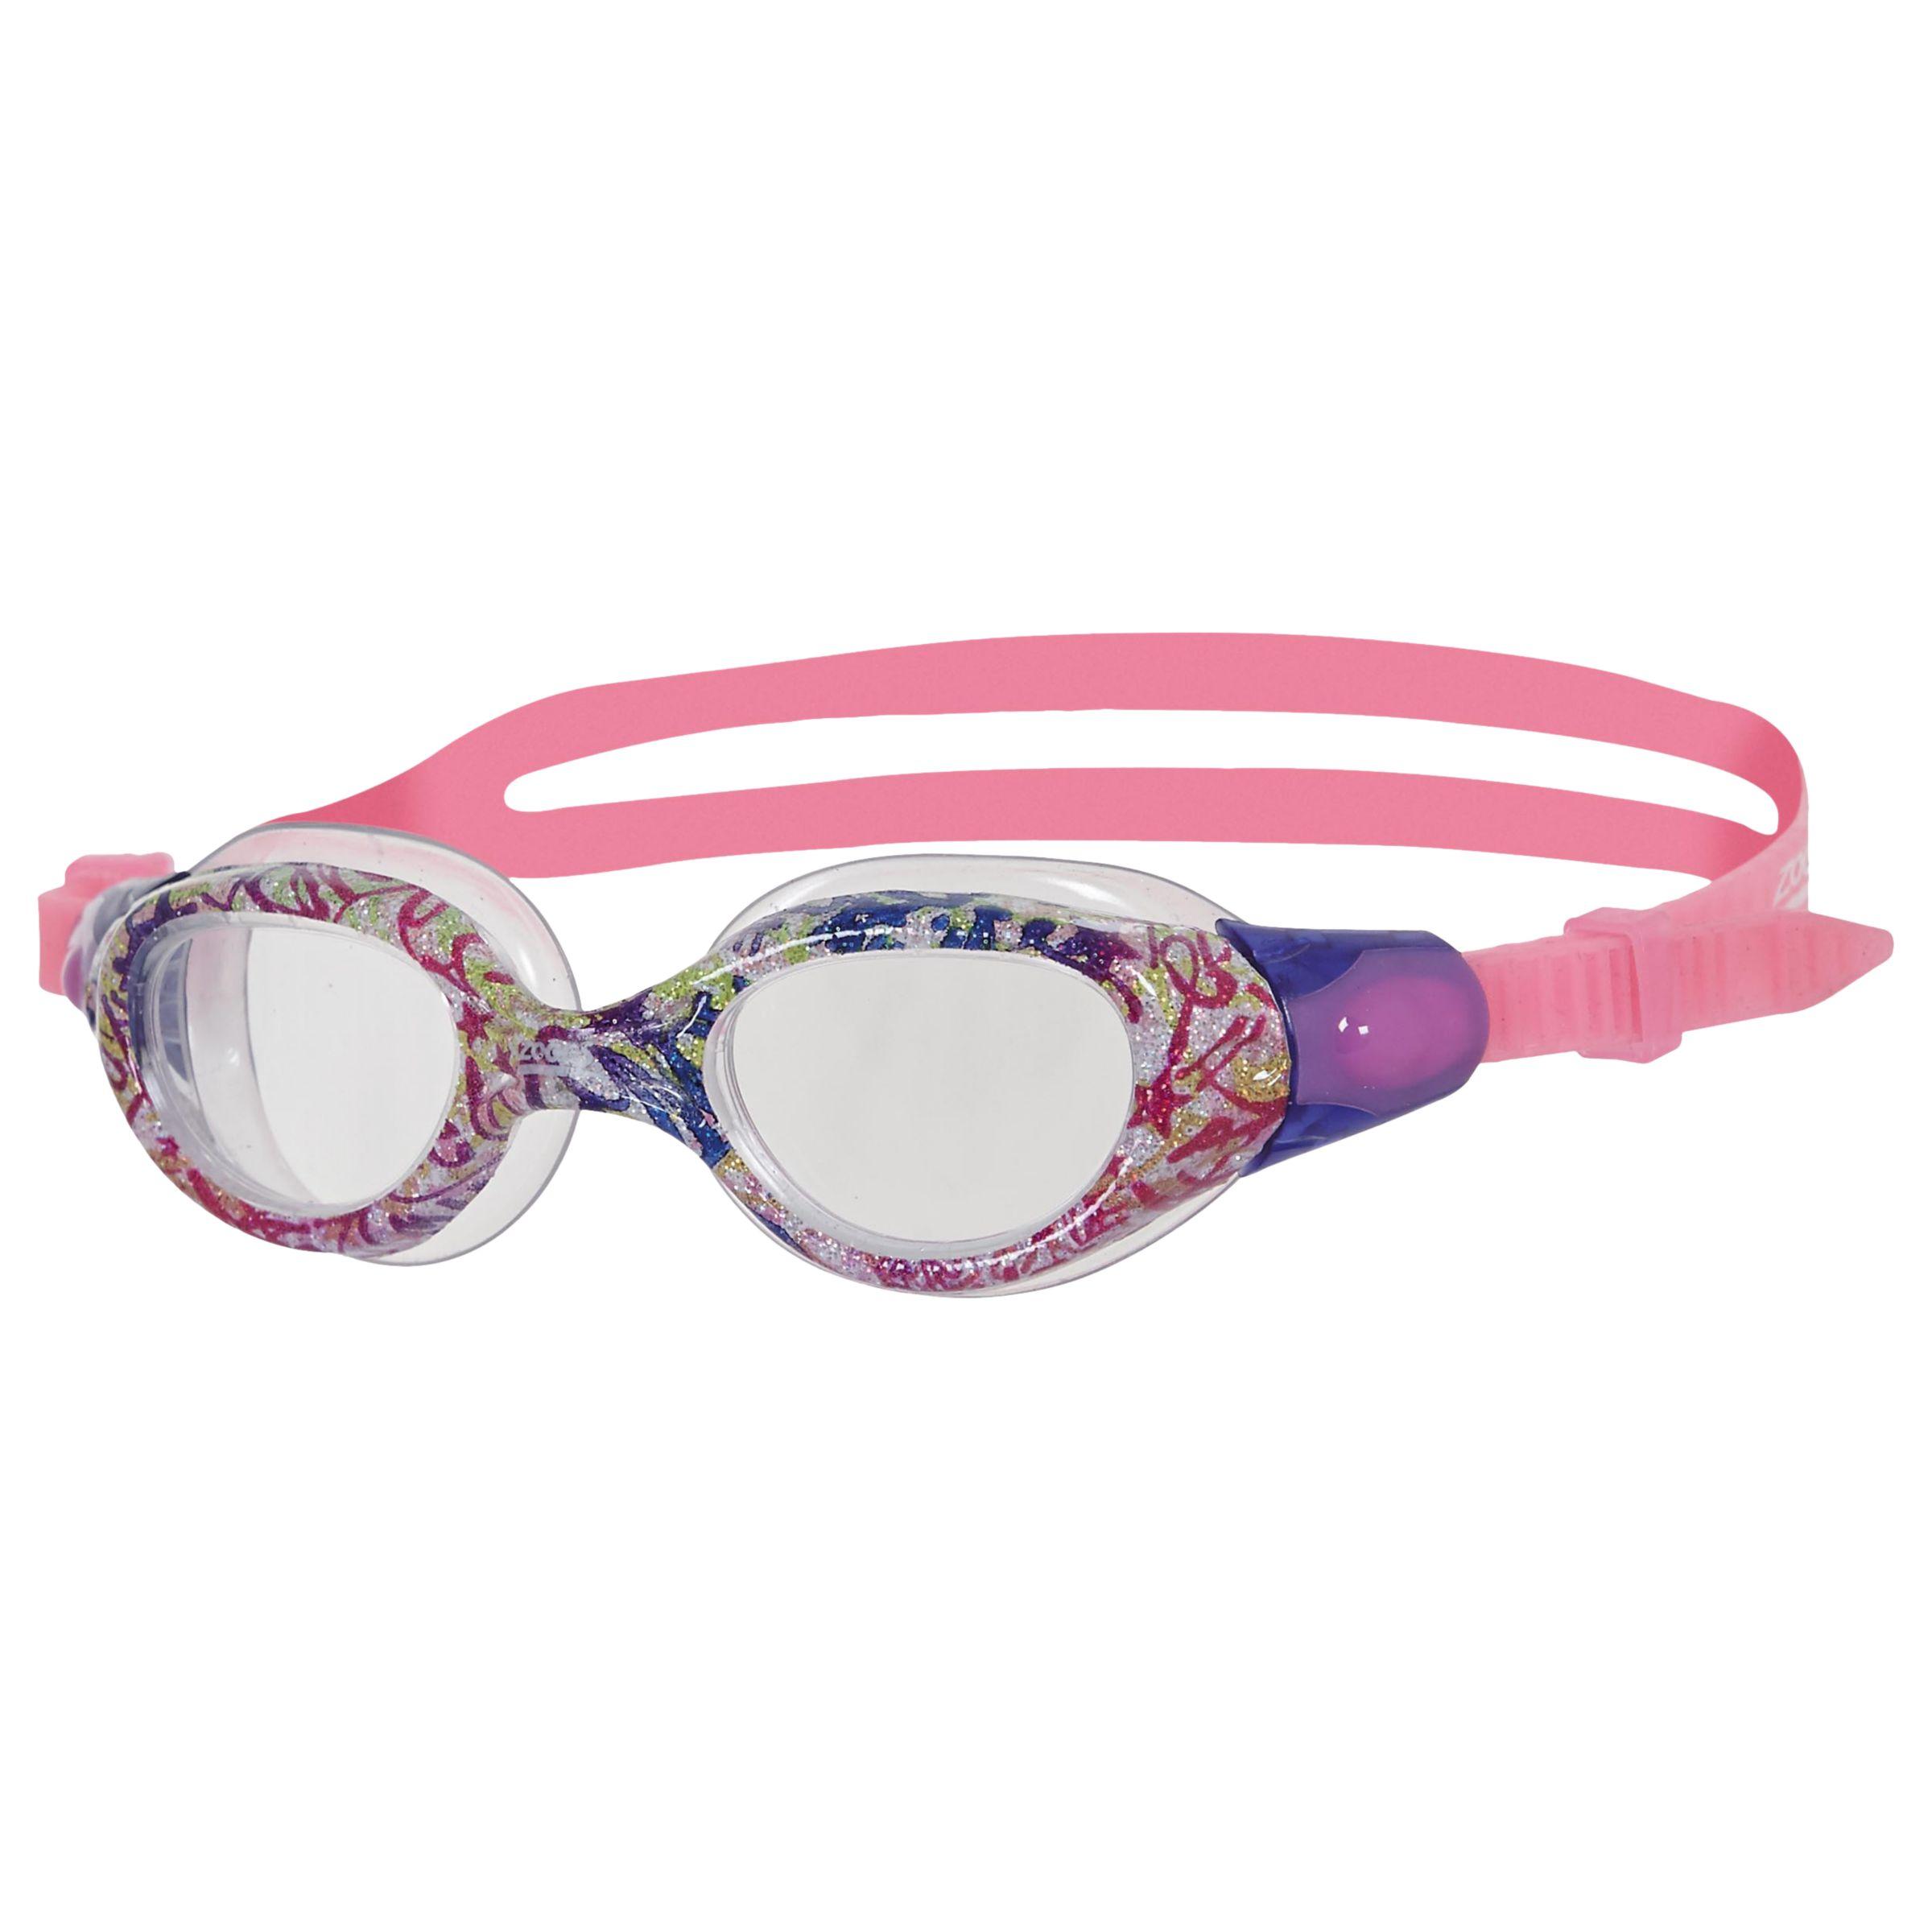 Zoggs Zoggs Little Comet Junior Swimming Goggles, Pink/Purple